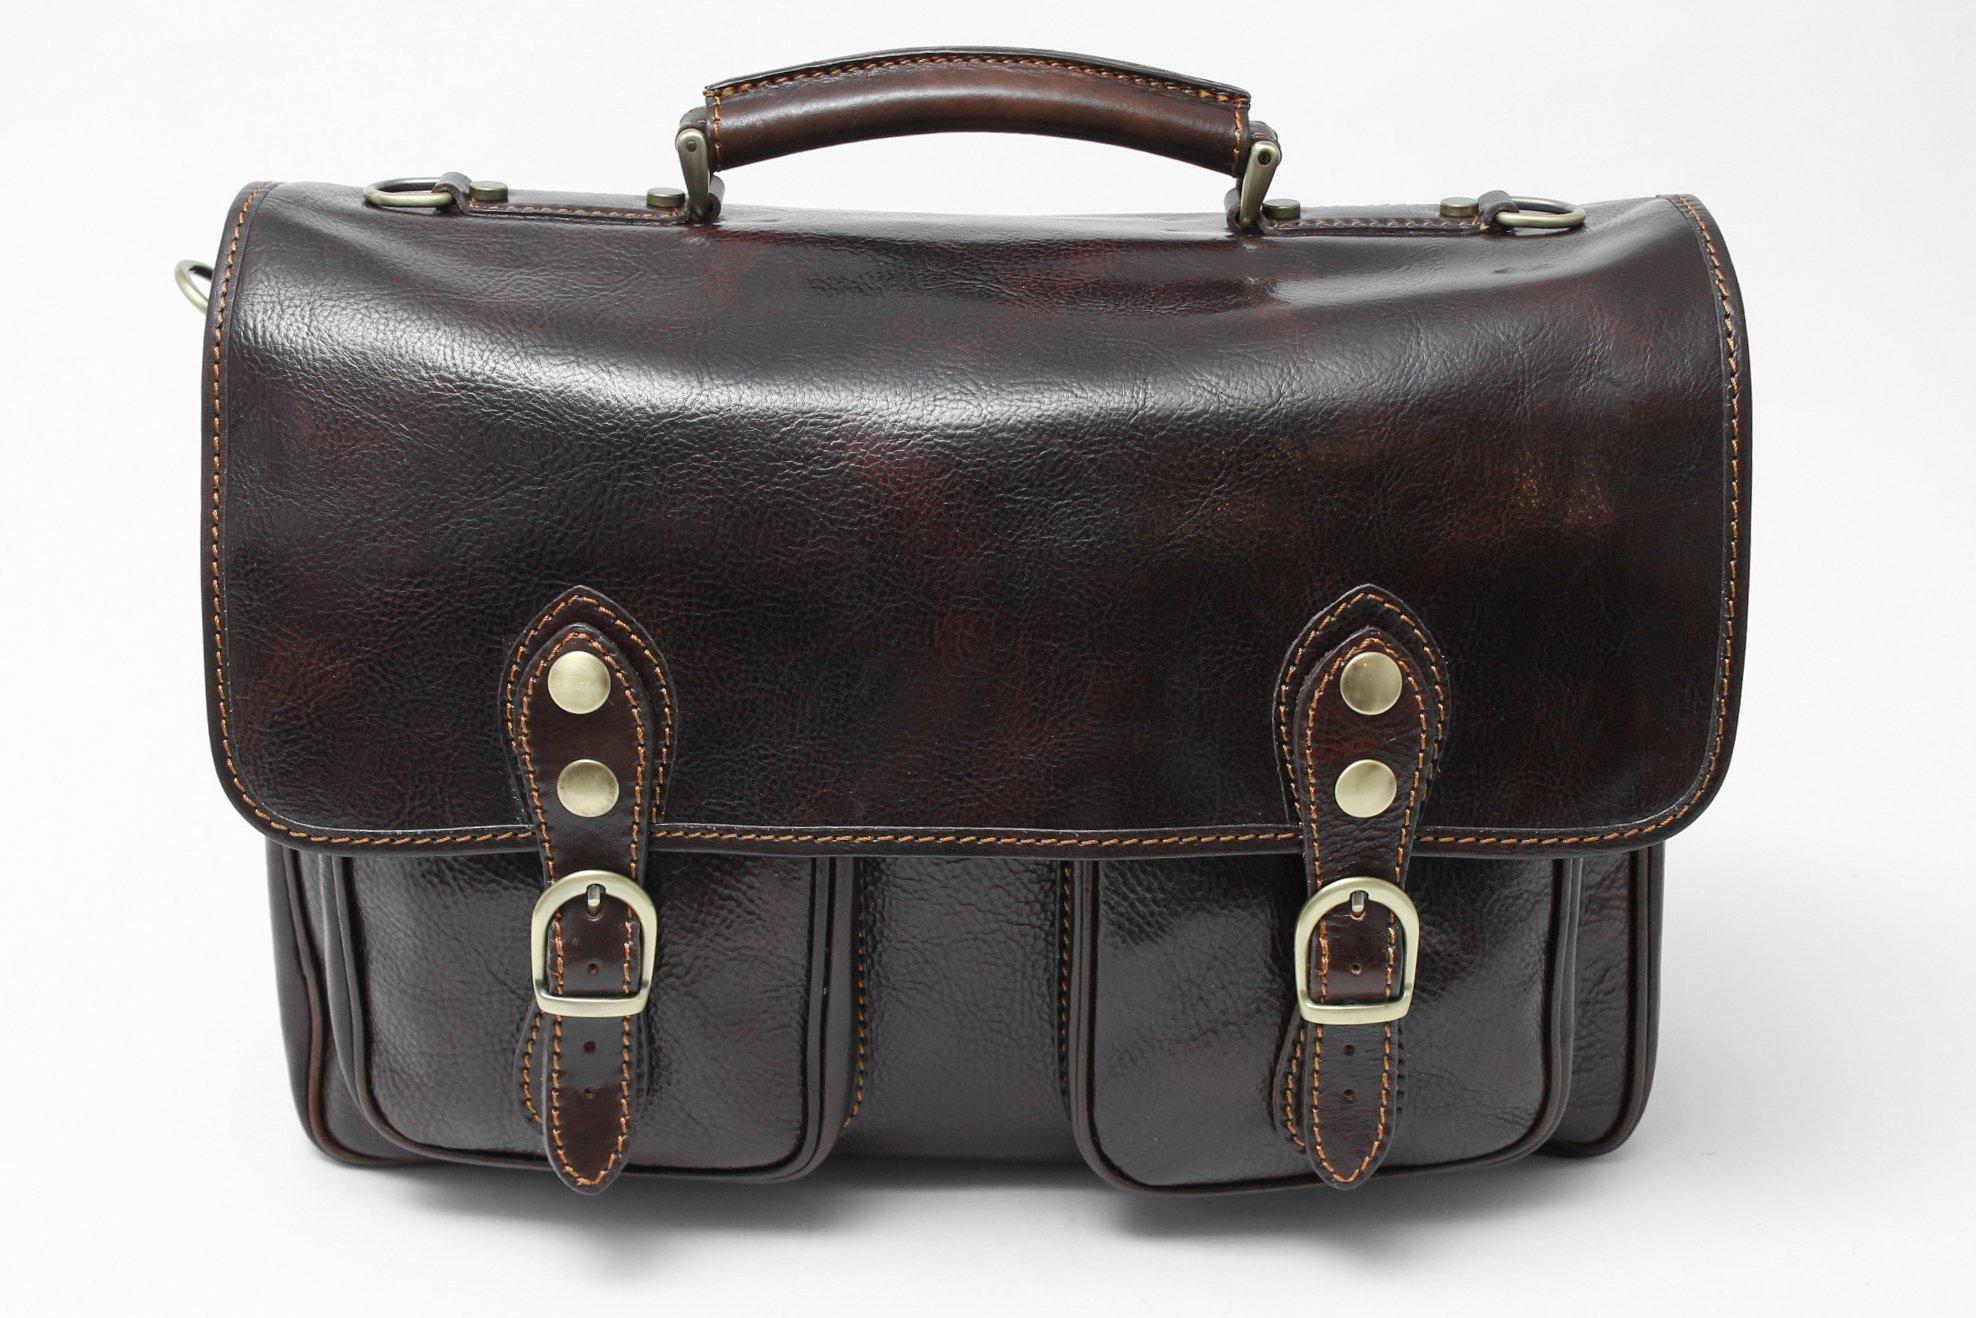 Alberto Bellucci Mens Italian Leather Parma Express Messenger Laptop Satchel Bag in Dark Brown by Alberto Bellucci